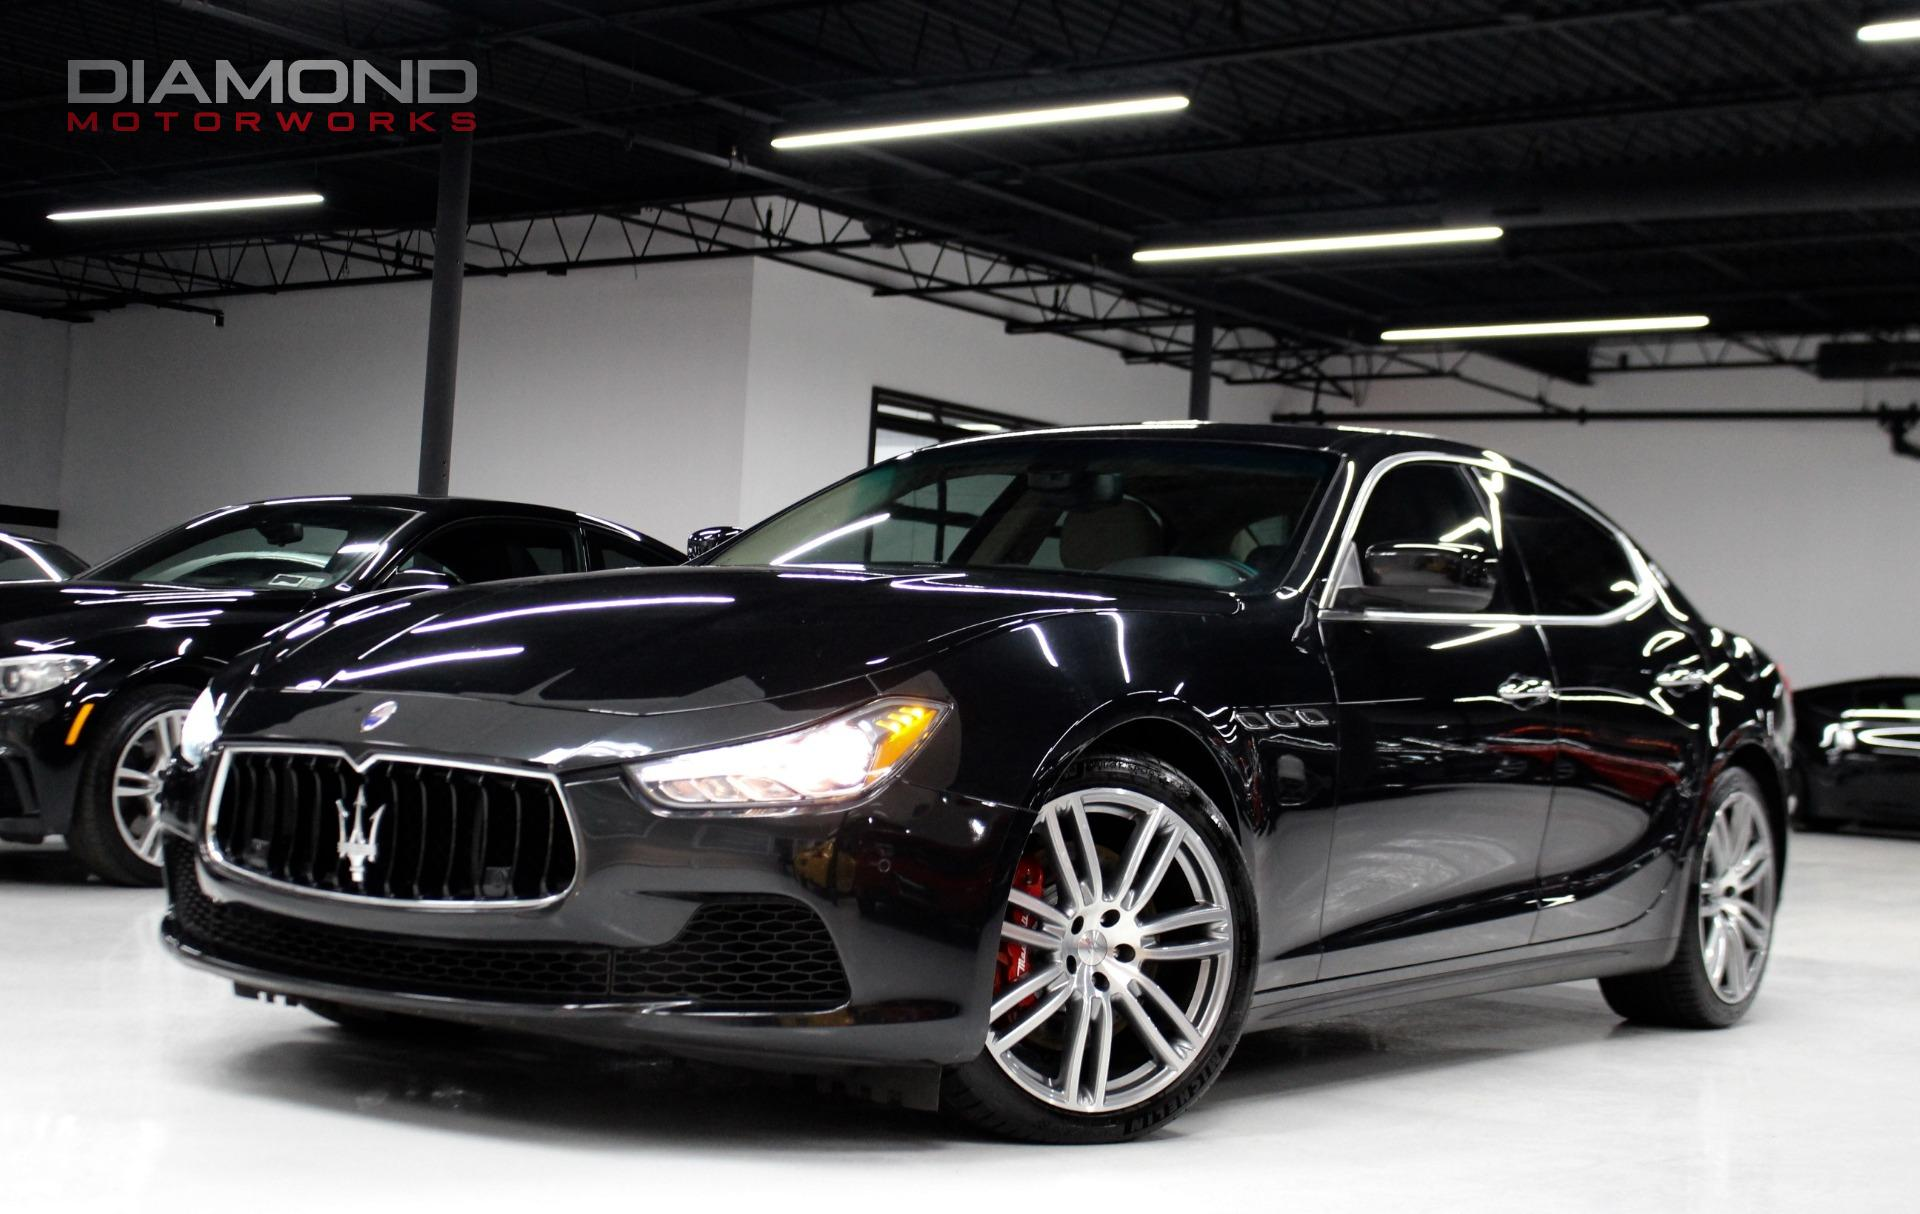 2015 Maserati Ghibli S Q4 Stock for sale near Lisle IL